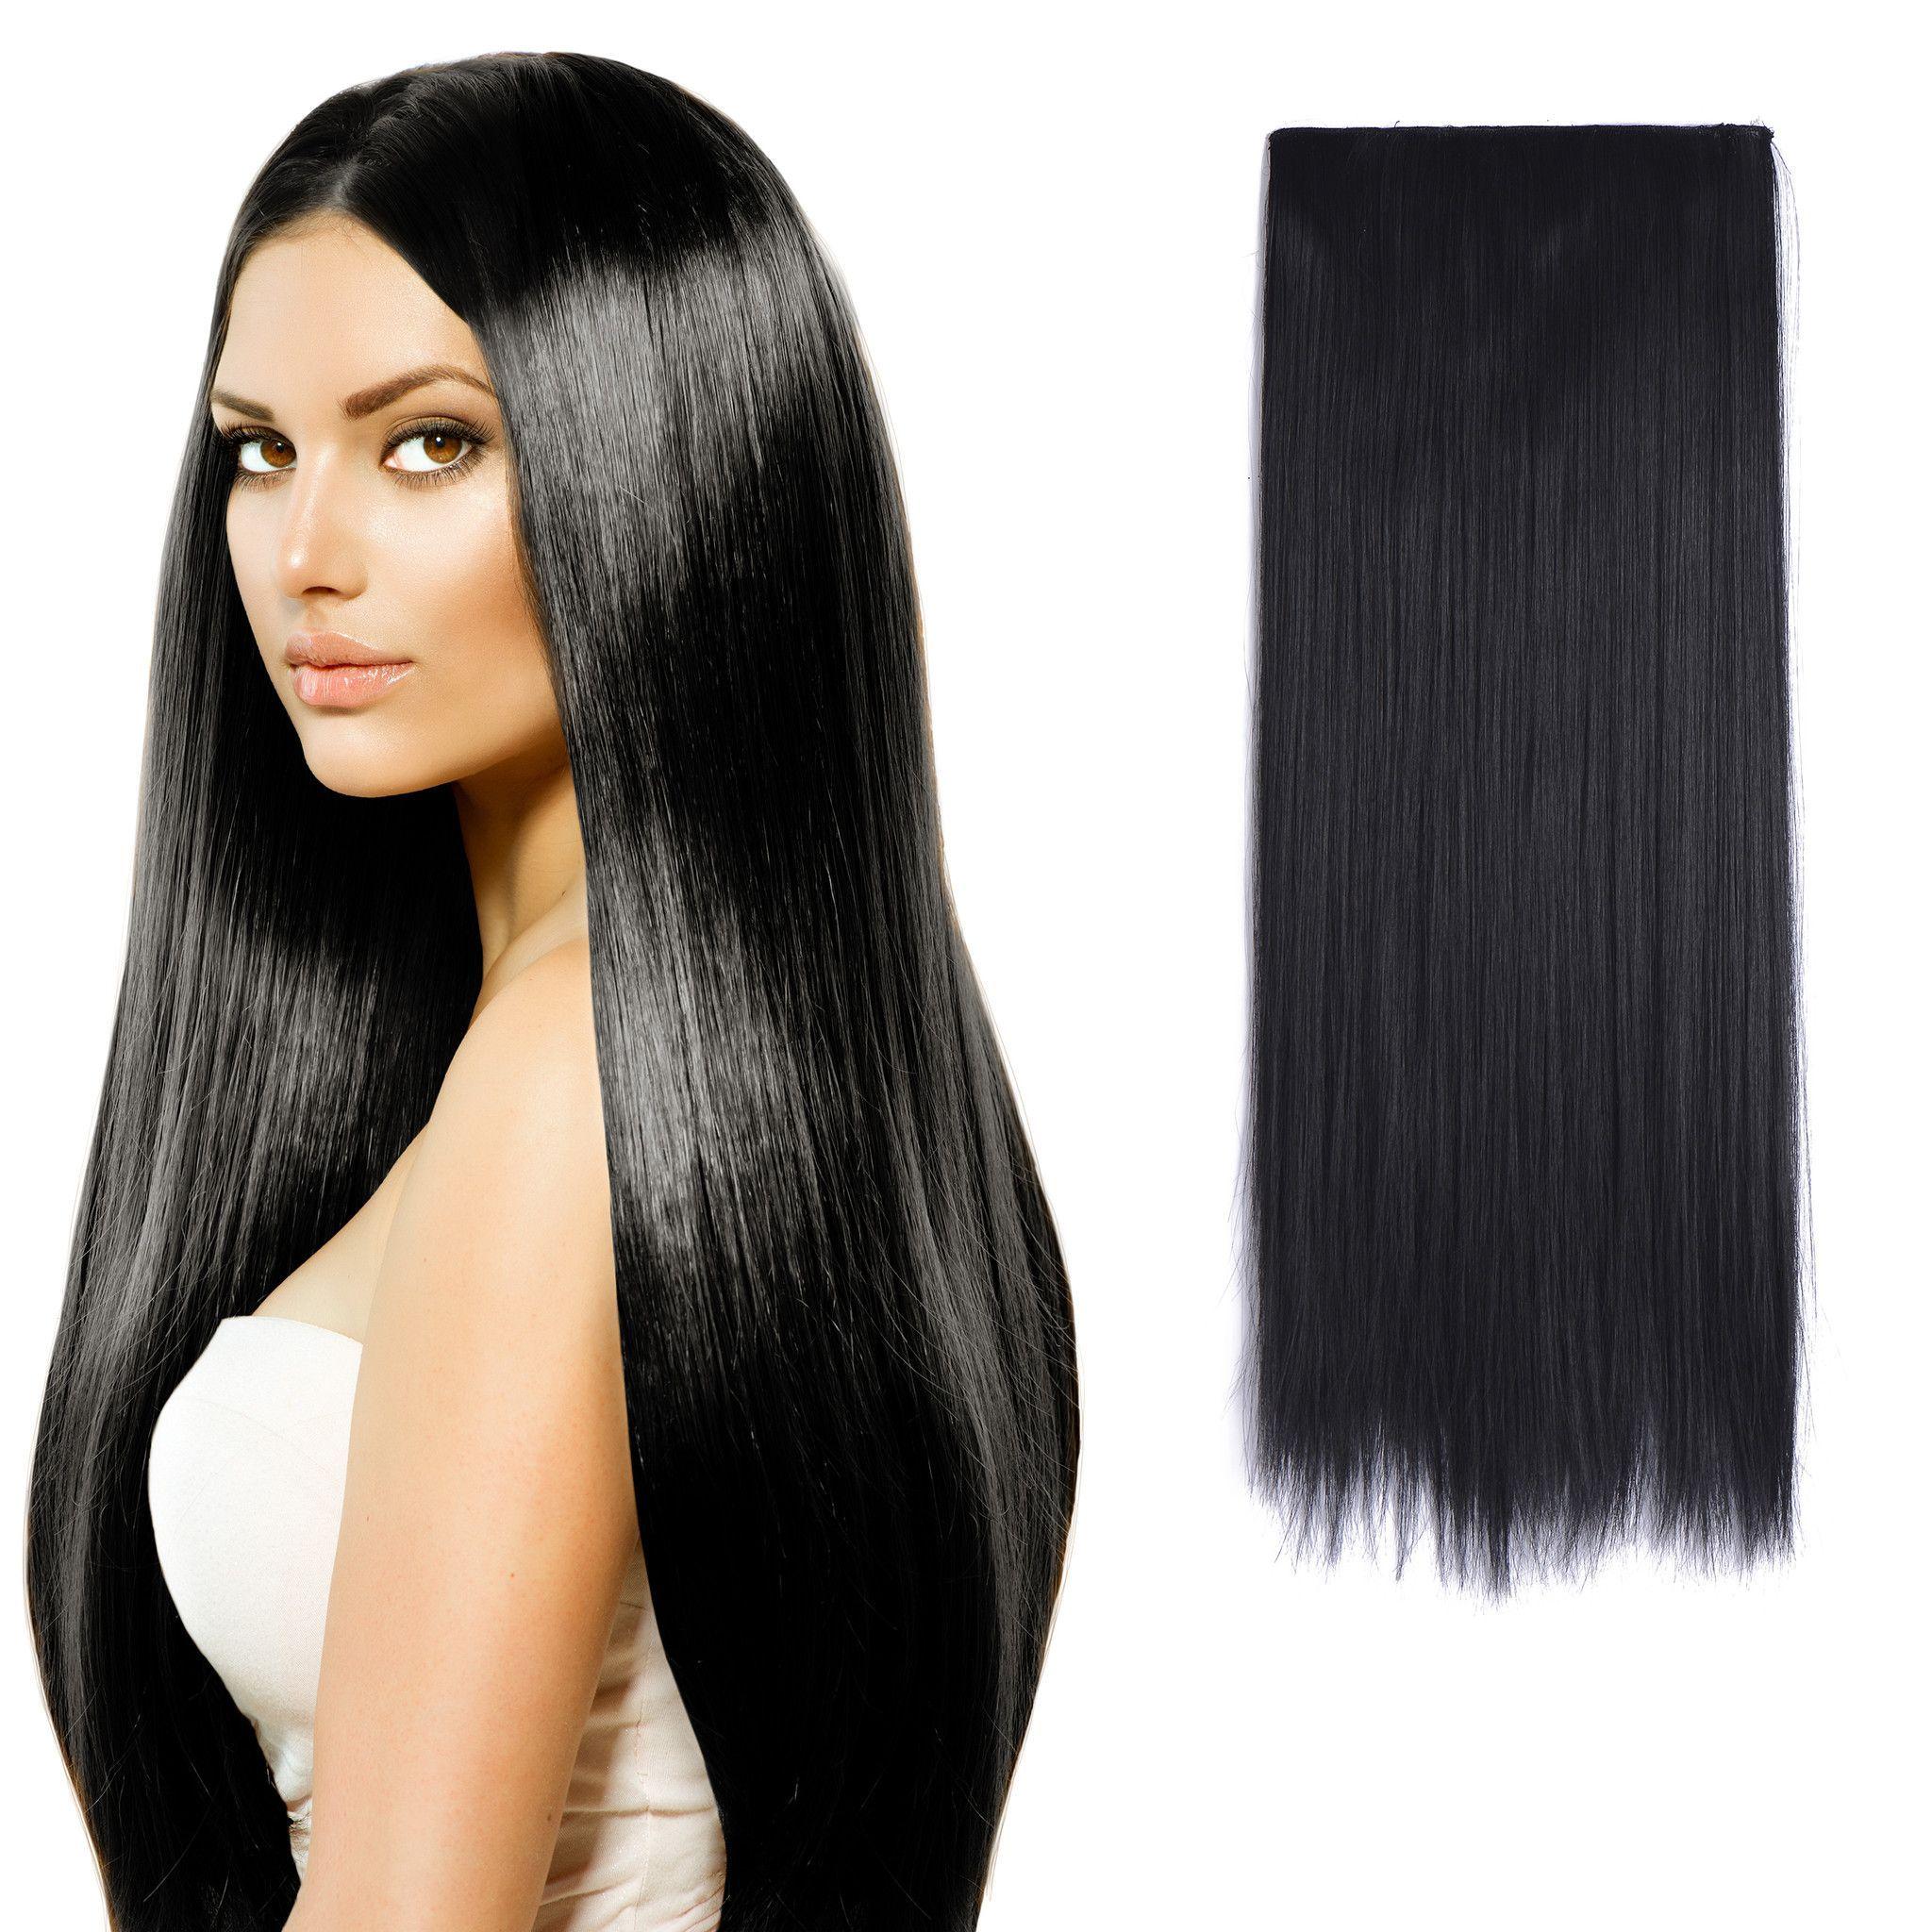 20 Curly 34 Full Head Kanekalon Futura Heat Resistance Hair